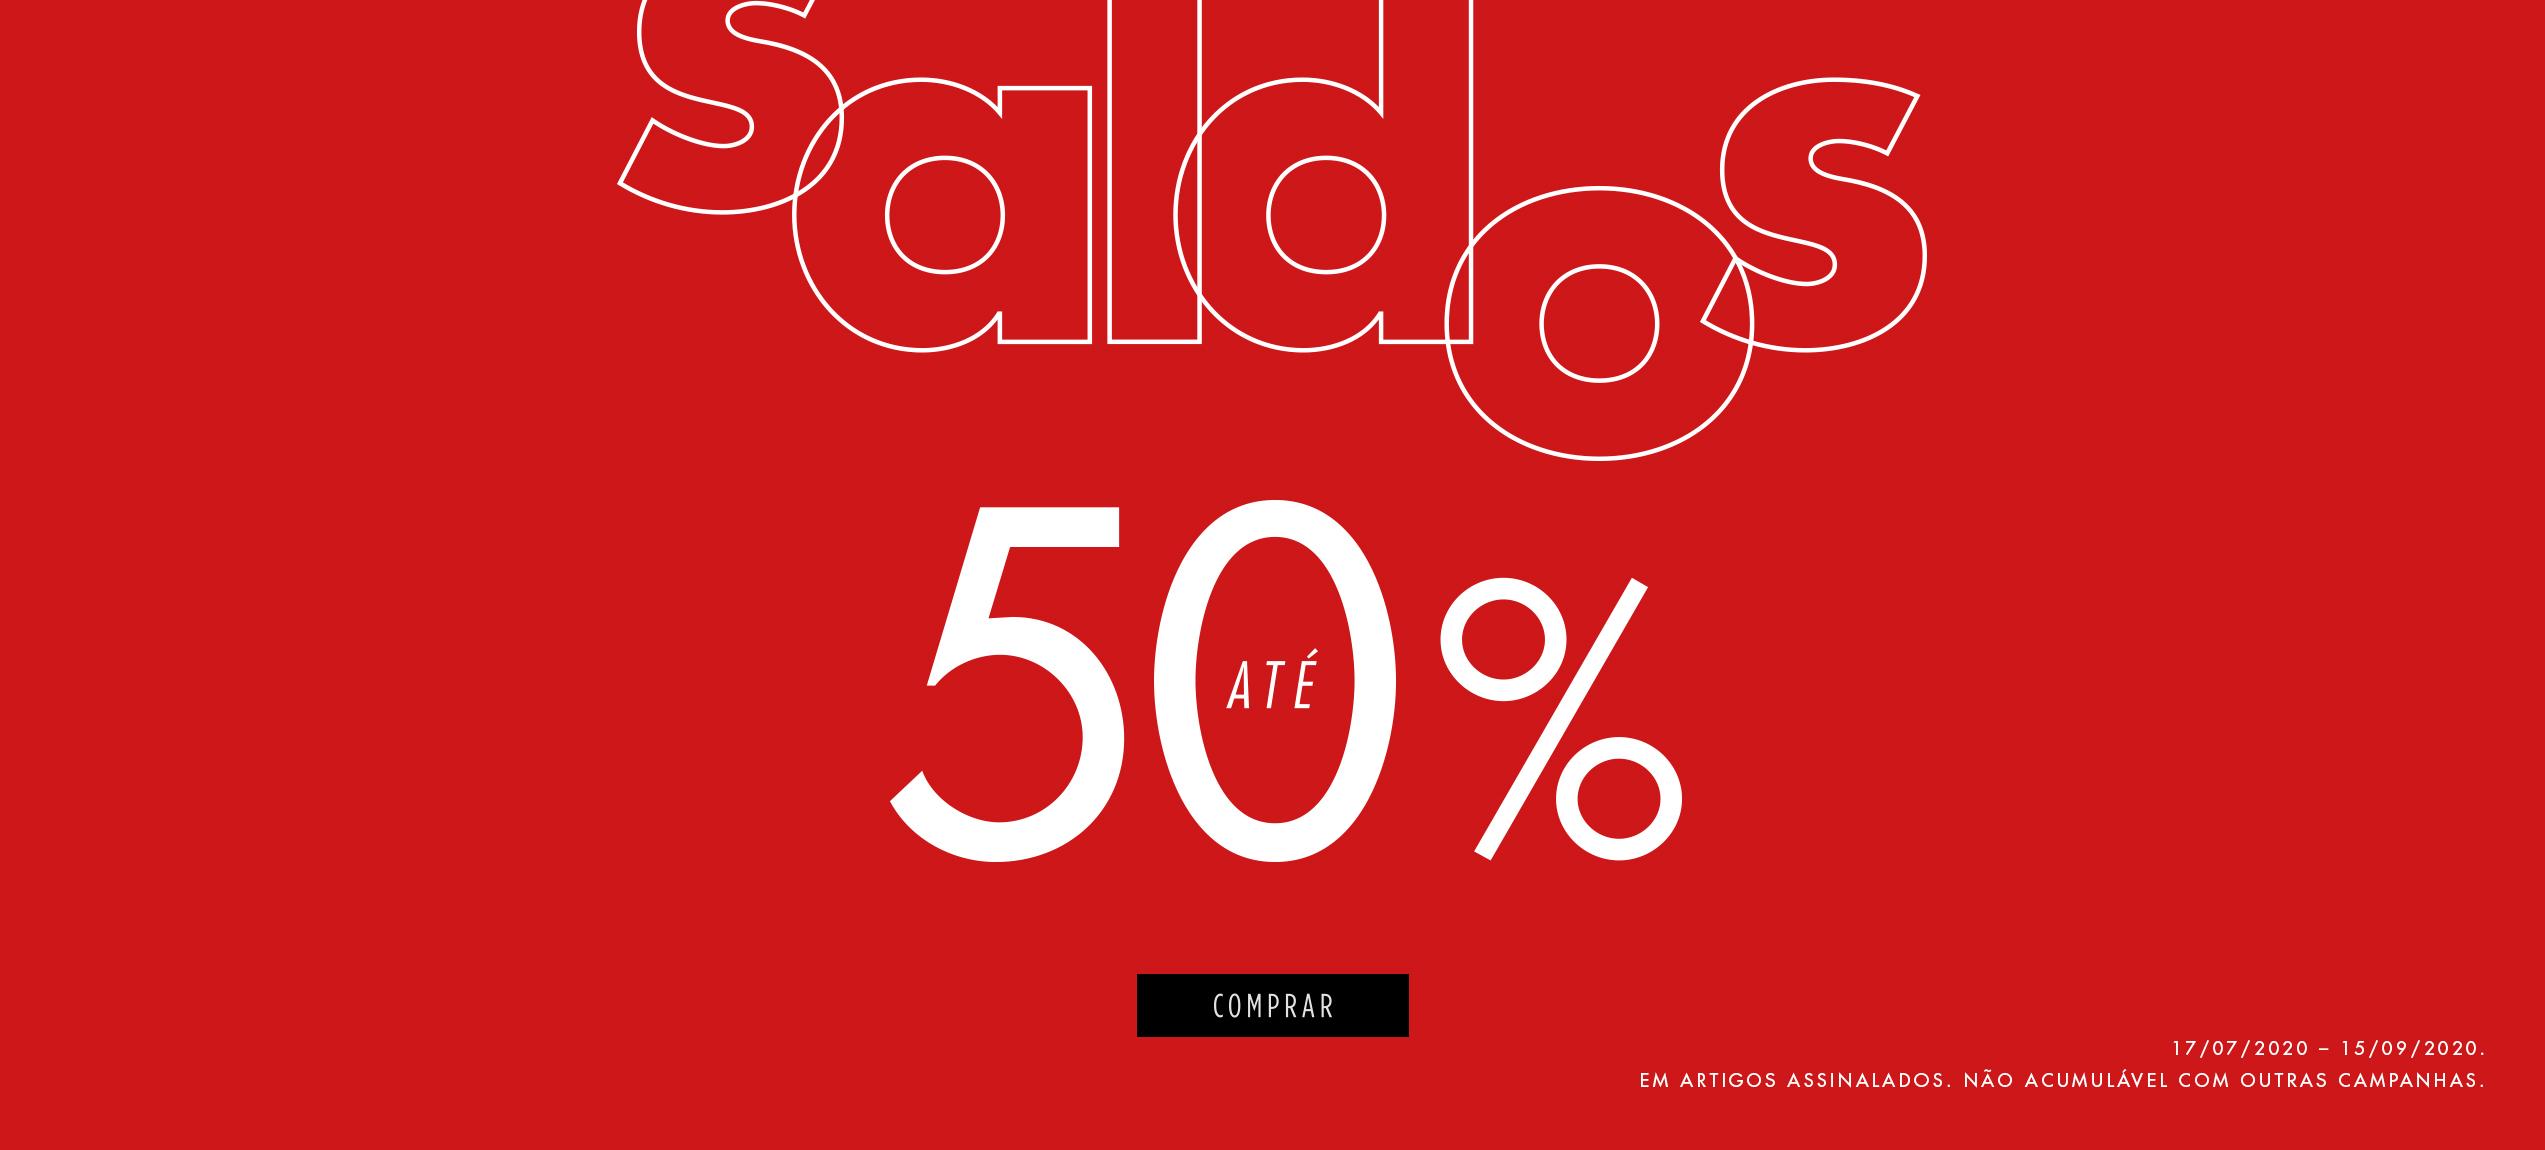 58_SALDOS_PT